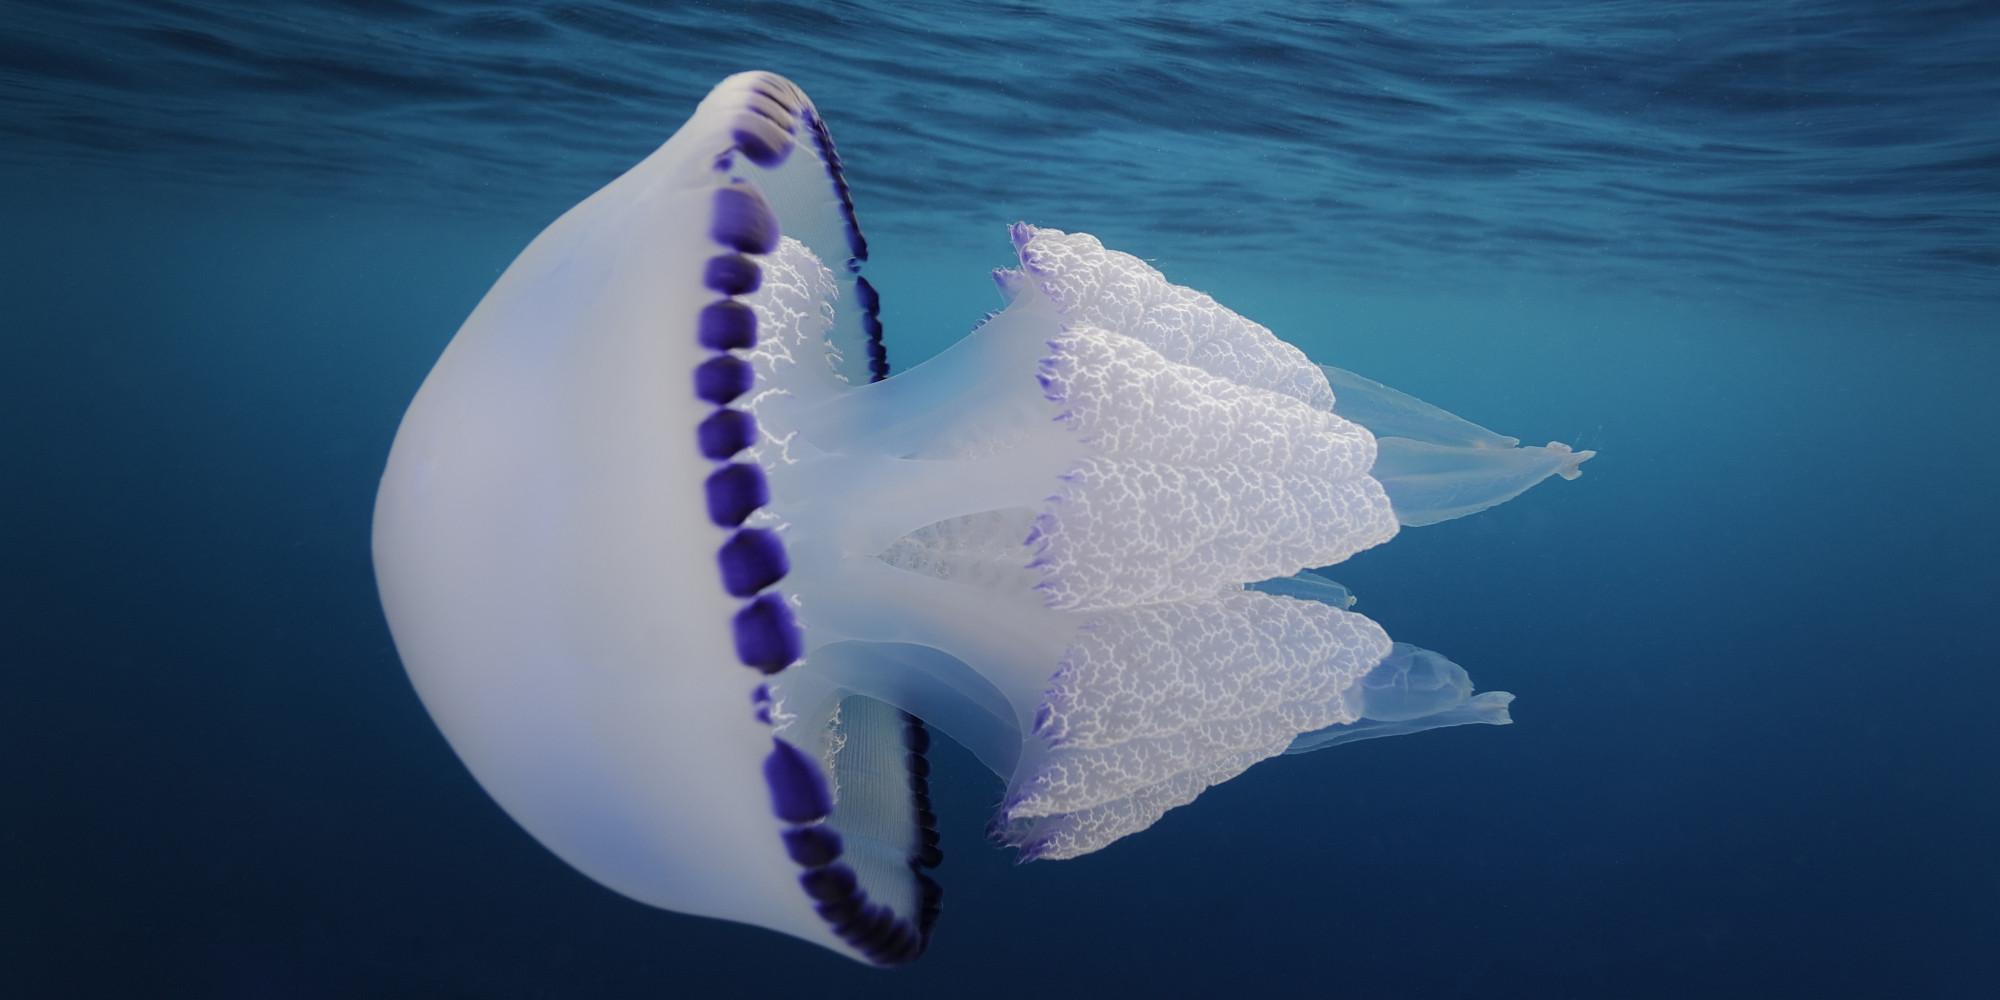 High Resolution Wallpaper | Jellyfish 2000x1000 px